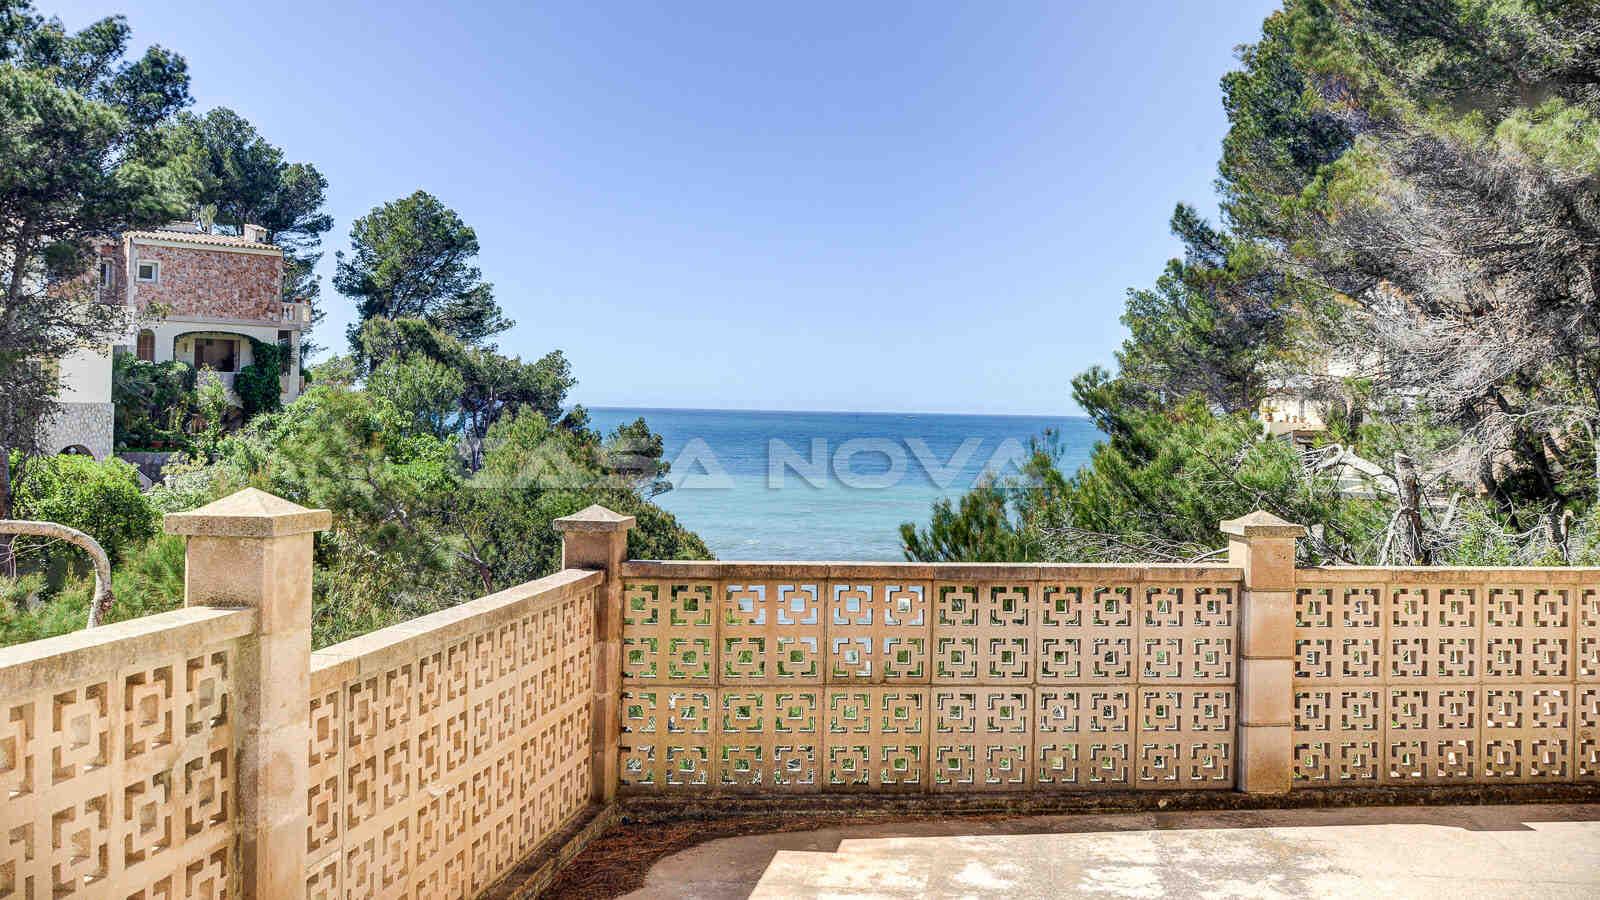 Immobilien kaufen Mallorca